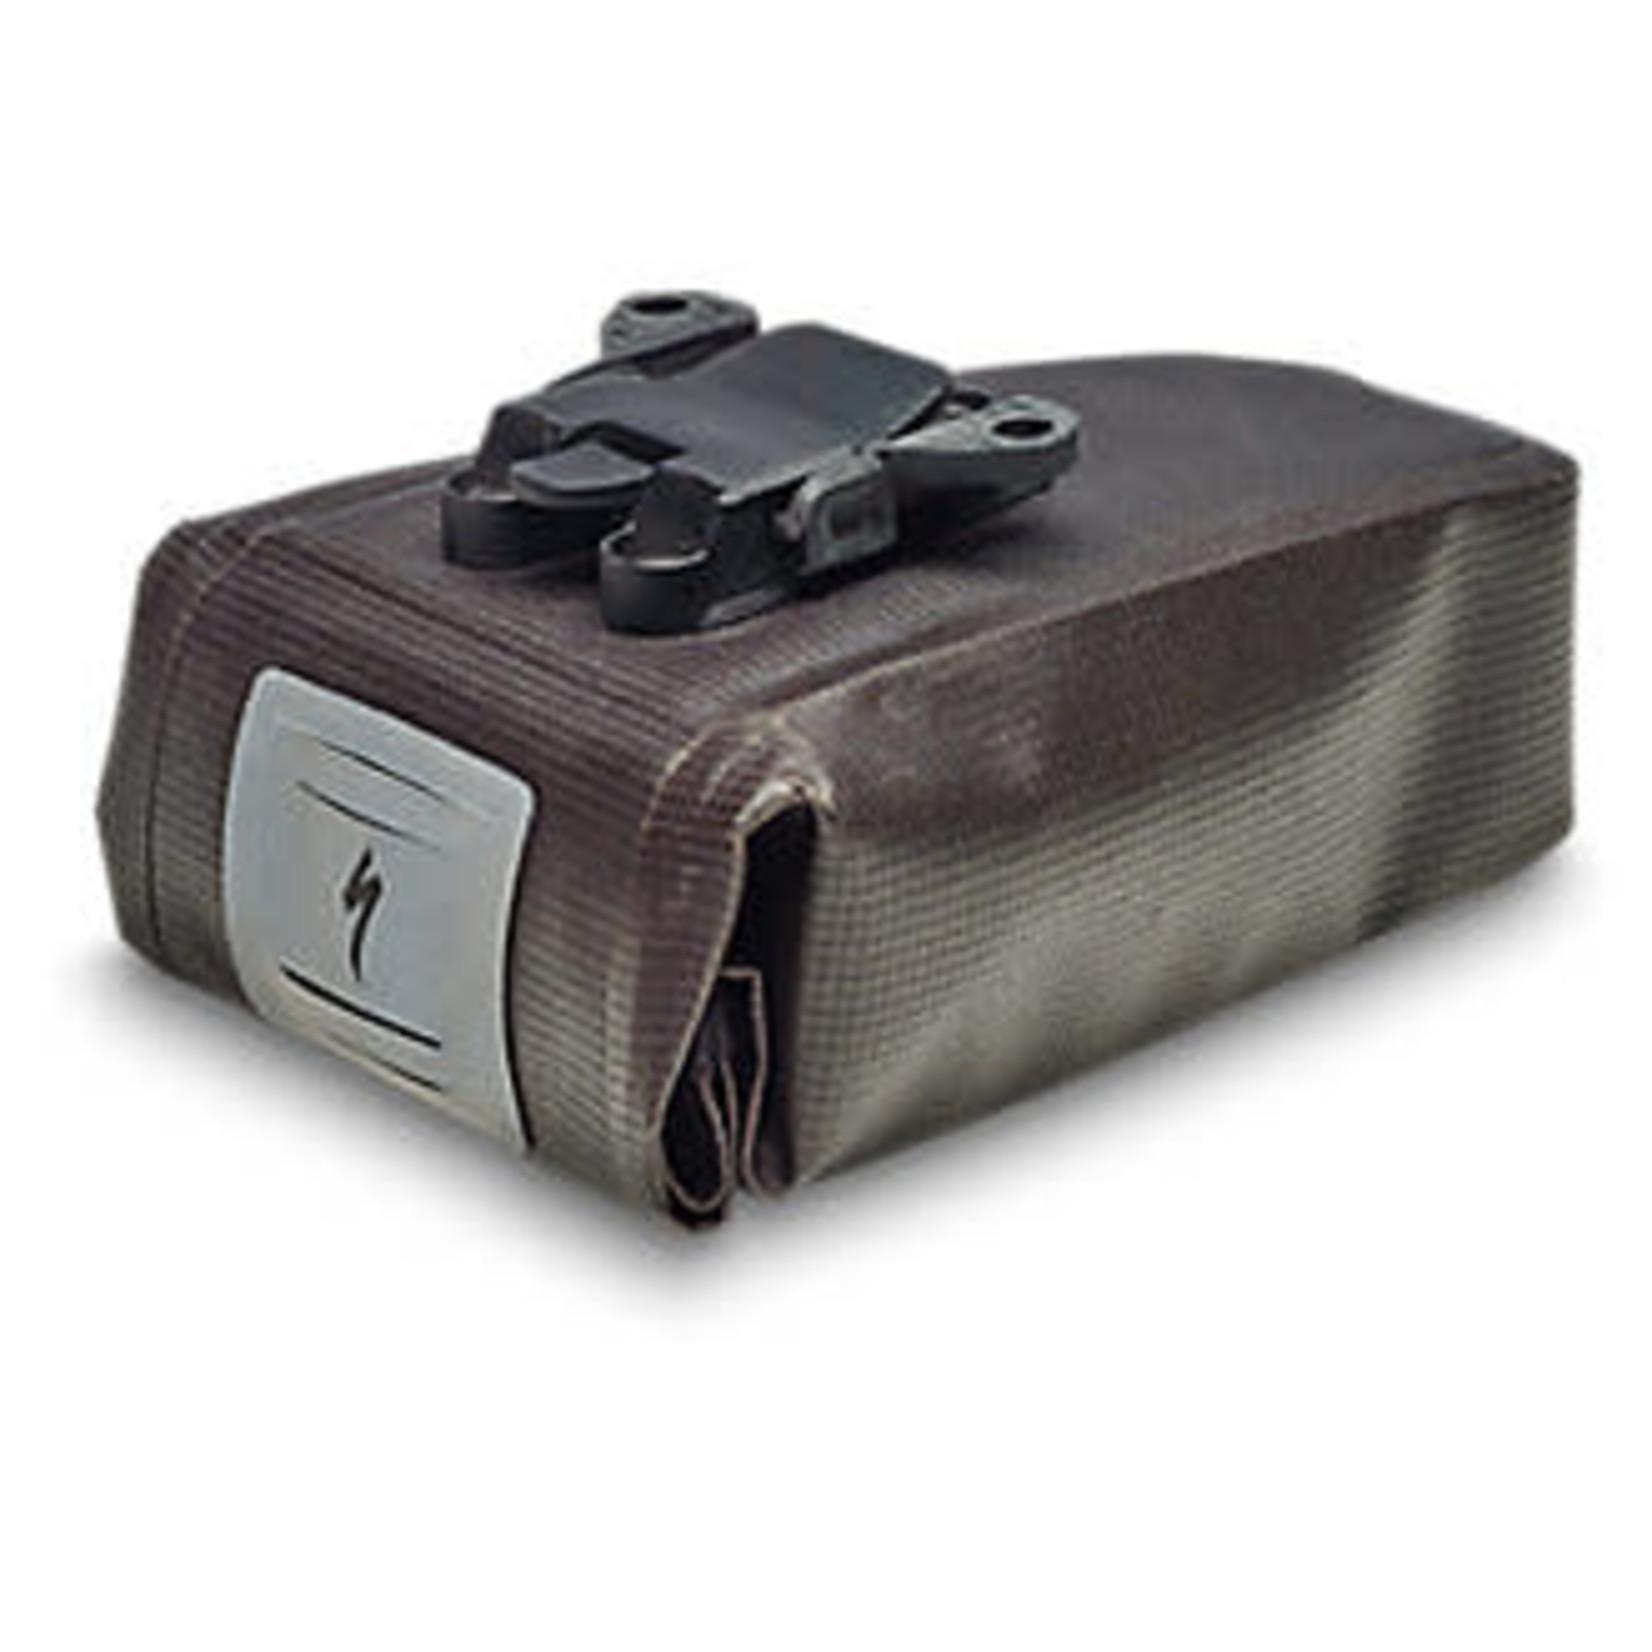 Specialized Specialized Stormproof Pack Saddlebag